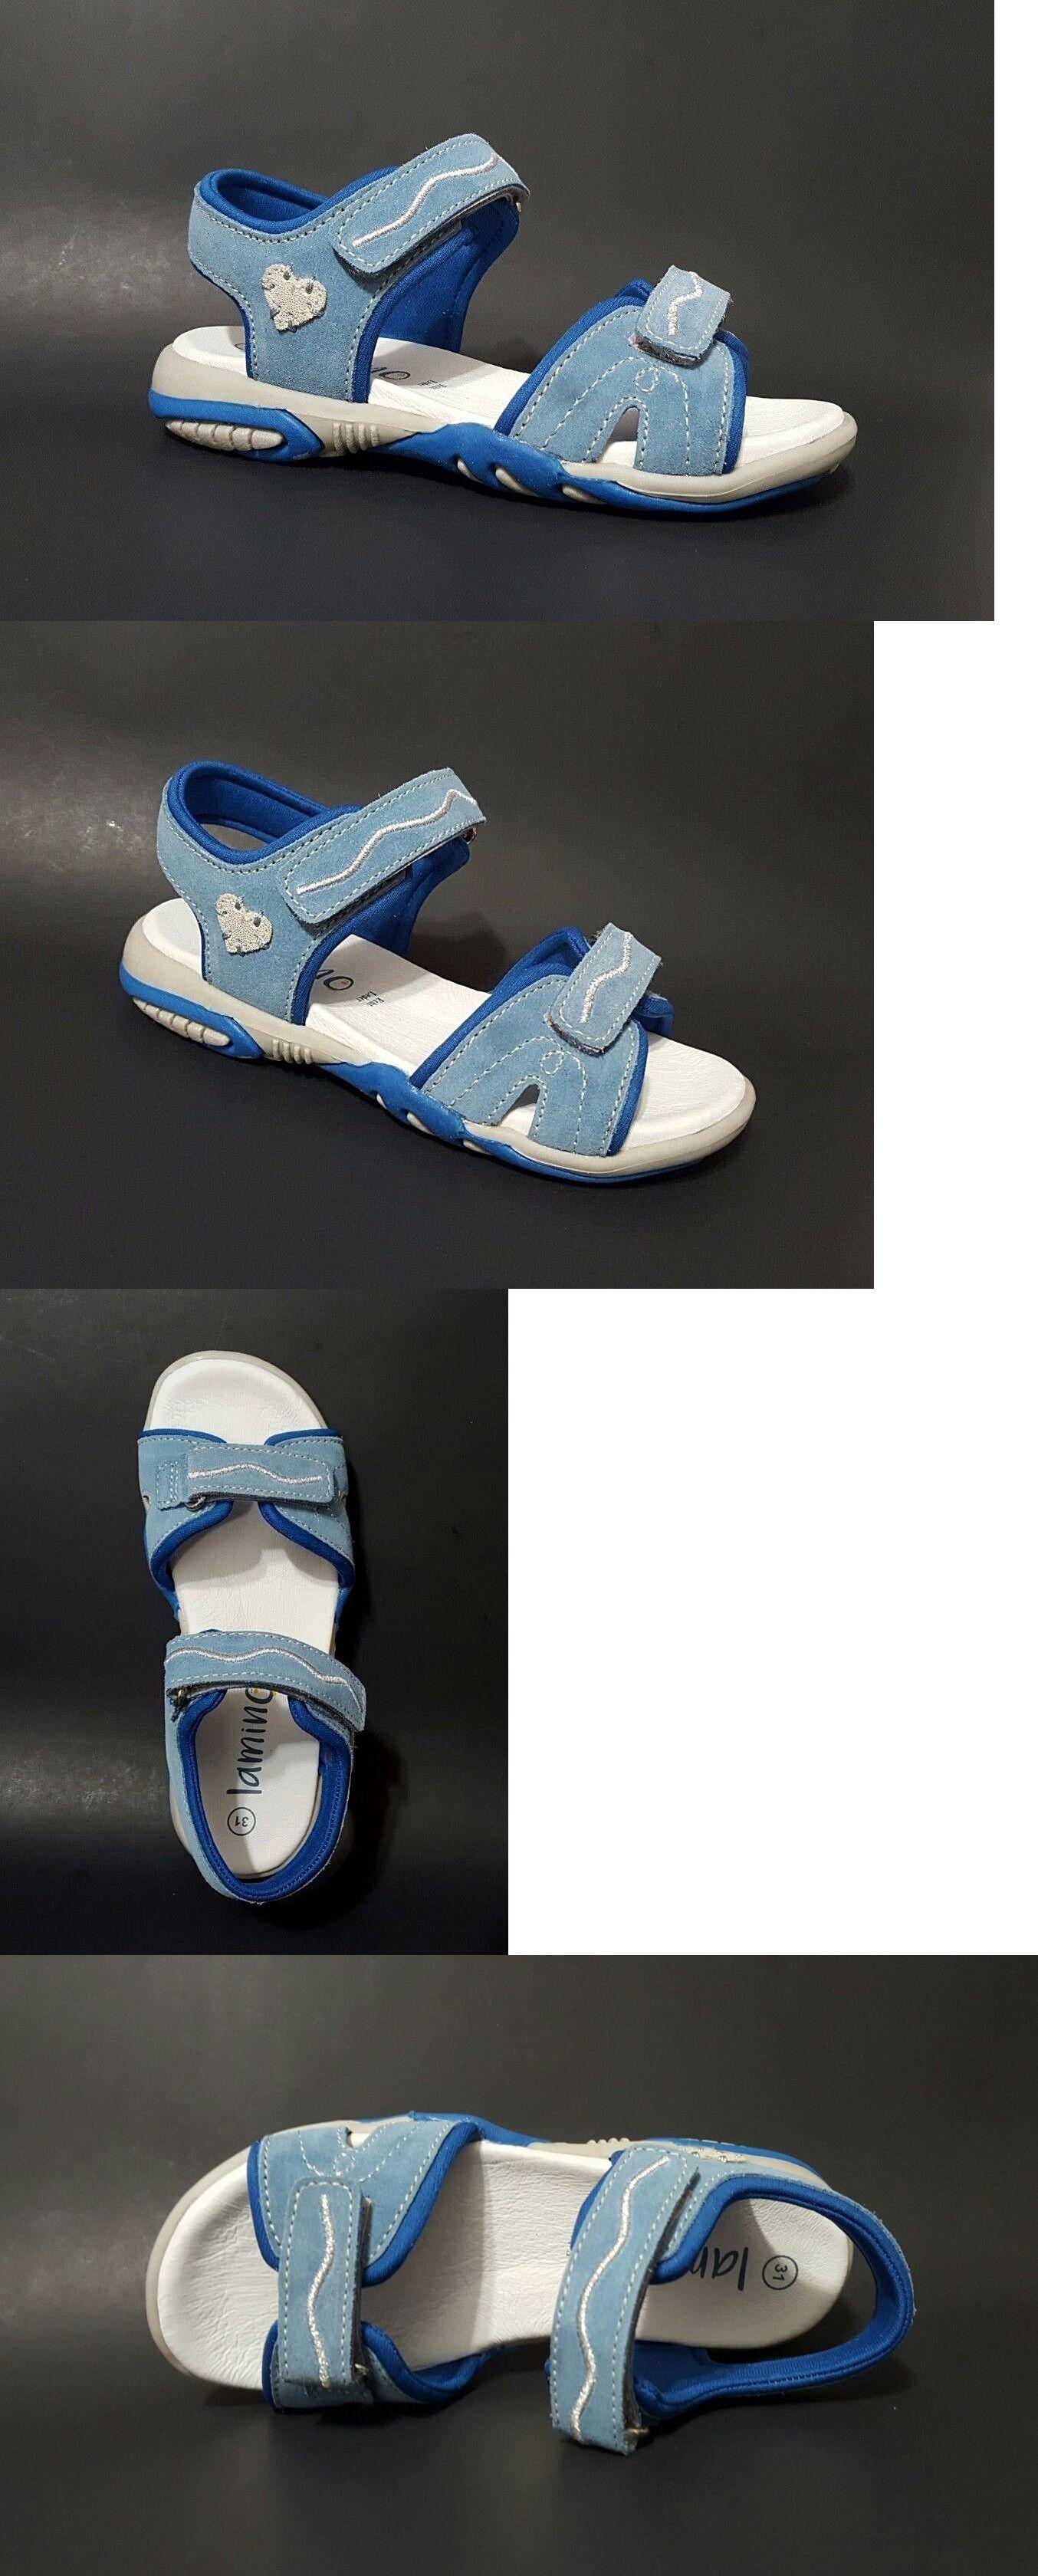 Girls 57974New65 Kids Fashion Lamino Sandals Shoes Pwkn0O